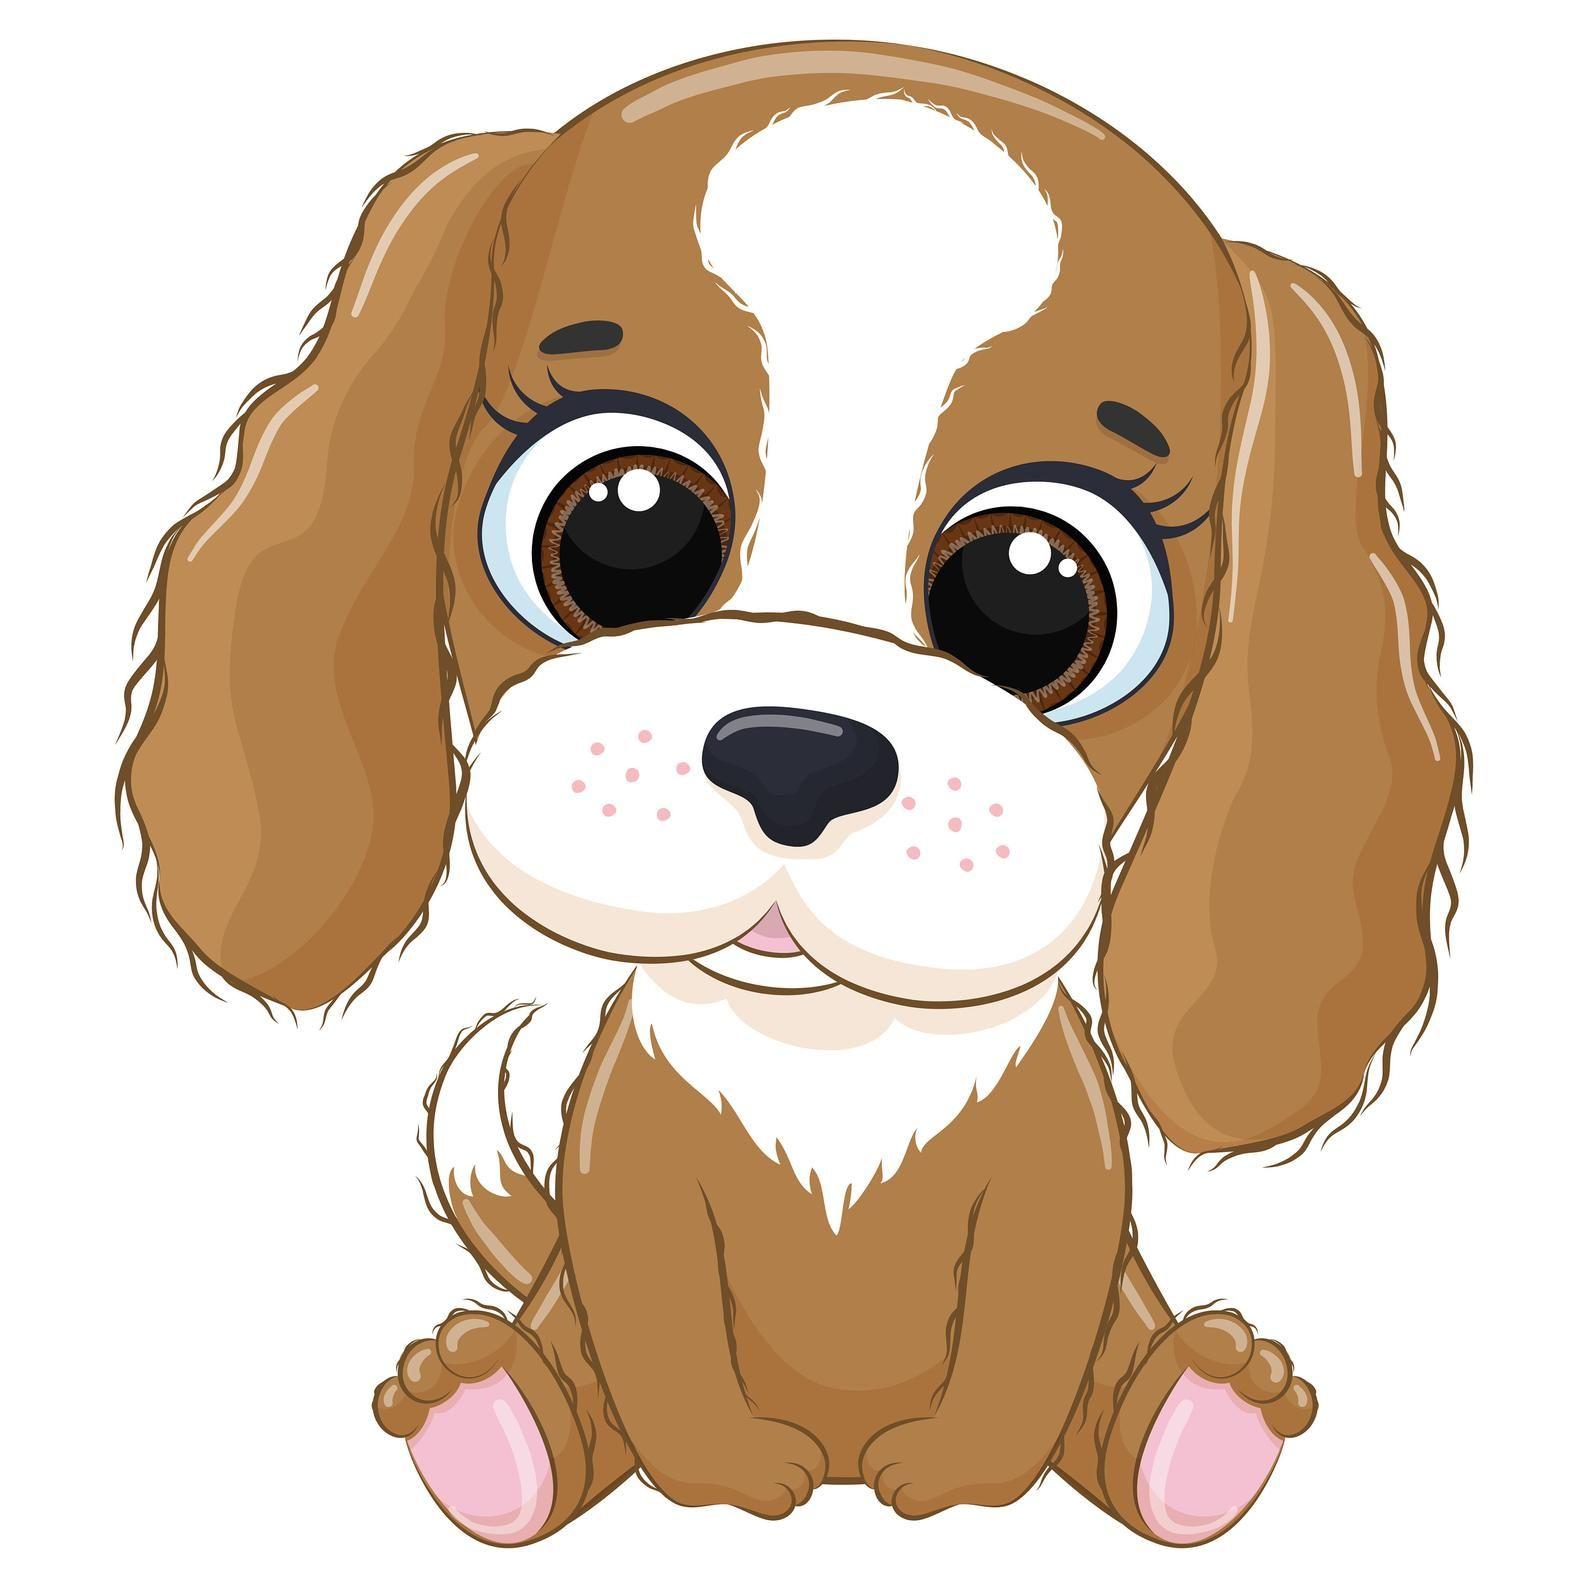 Cute Dog Clipart Eps Png Jpeg Pets Clipart Cute Animal Clipart Doggy Clipart In 2021 Cute Animal Clipart Animal Clipart Cute Animals